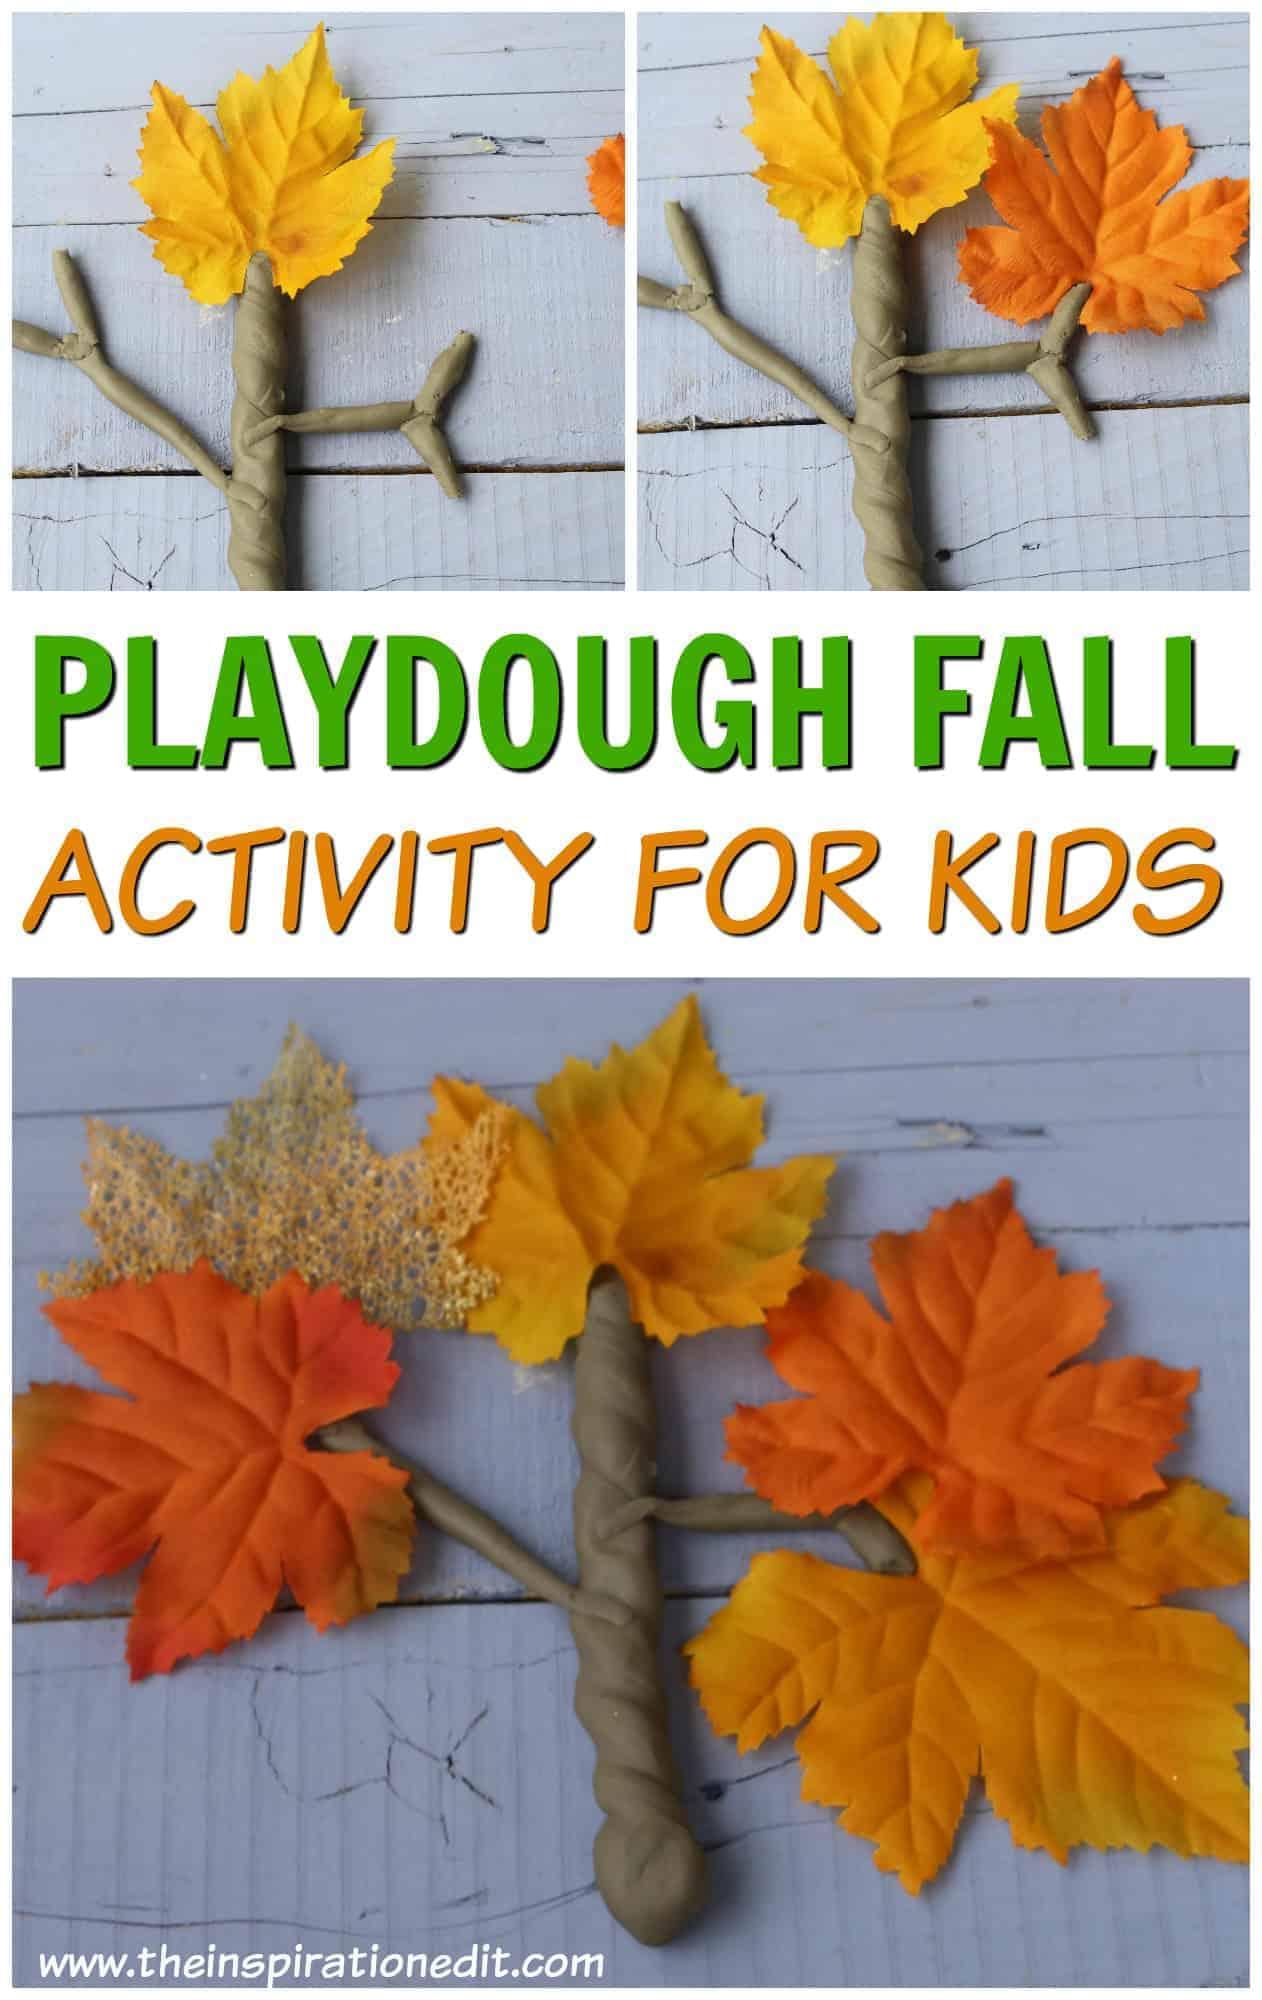 Playdough Fall activity for kids